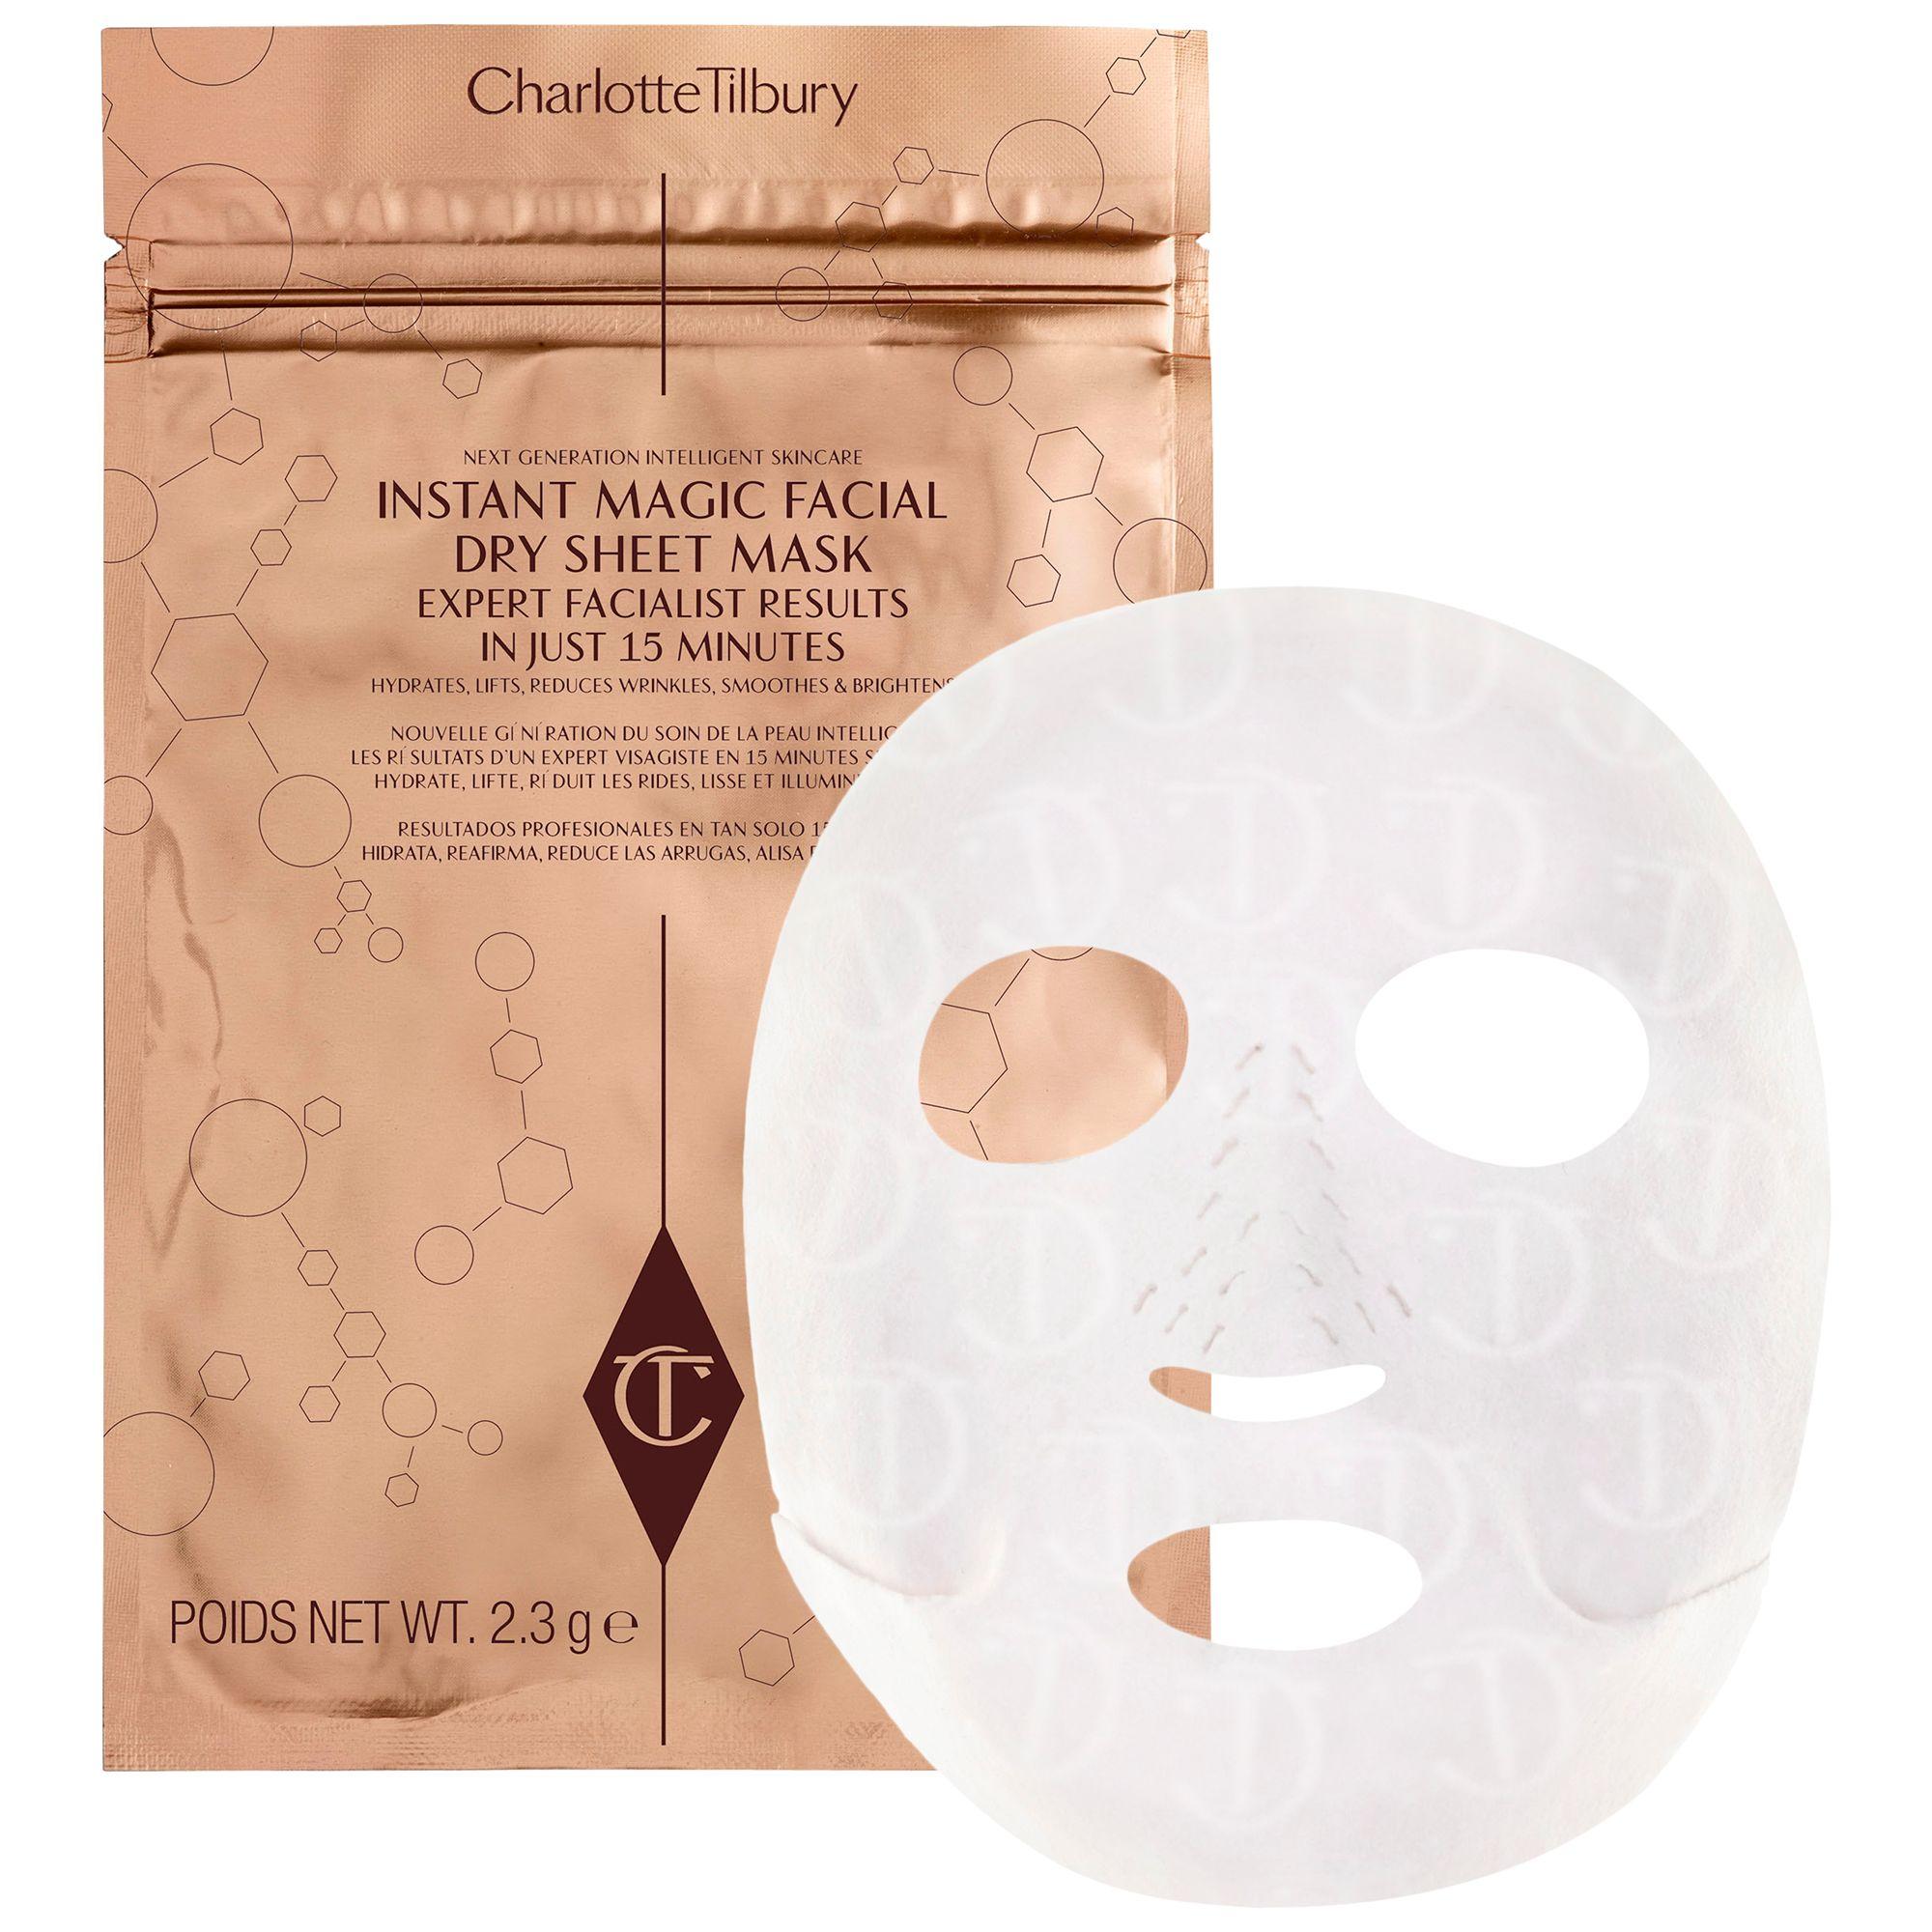 Charlotte Tilbury Charlotte Tilbury Instant Magic Facial Dry Sheet Mask, x 4